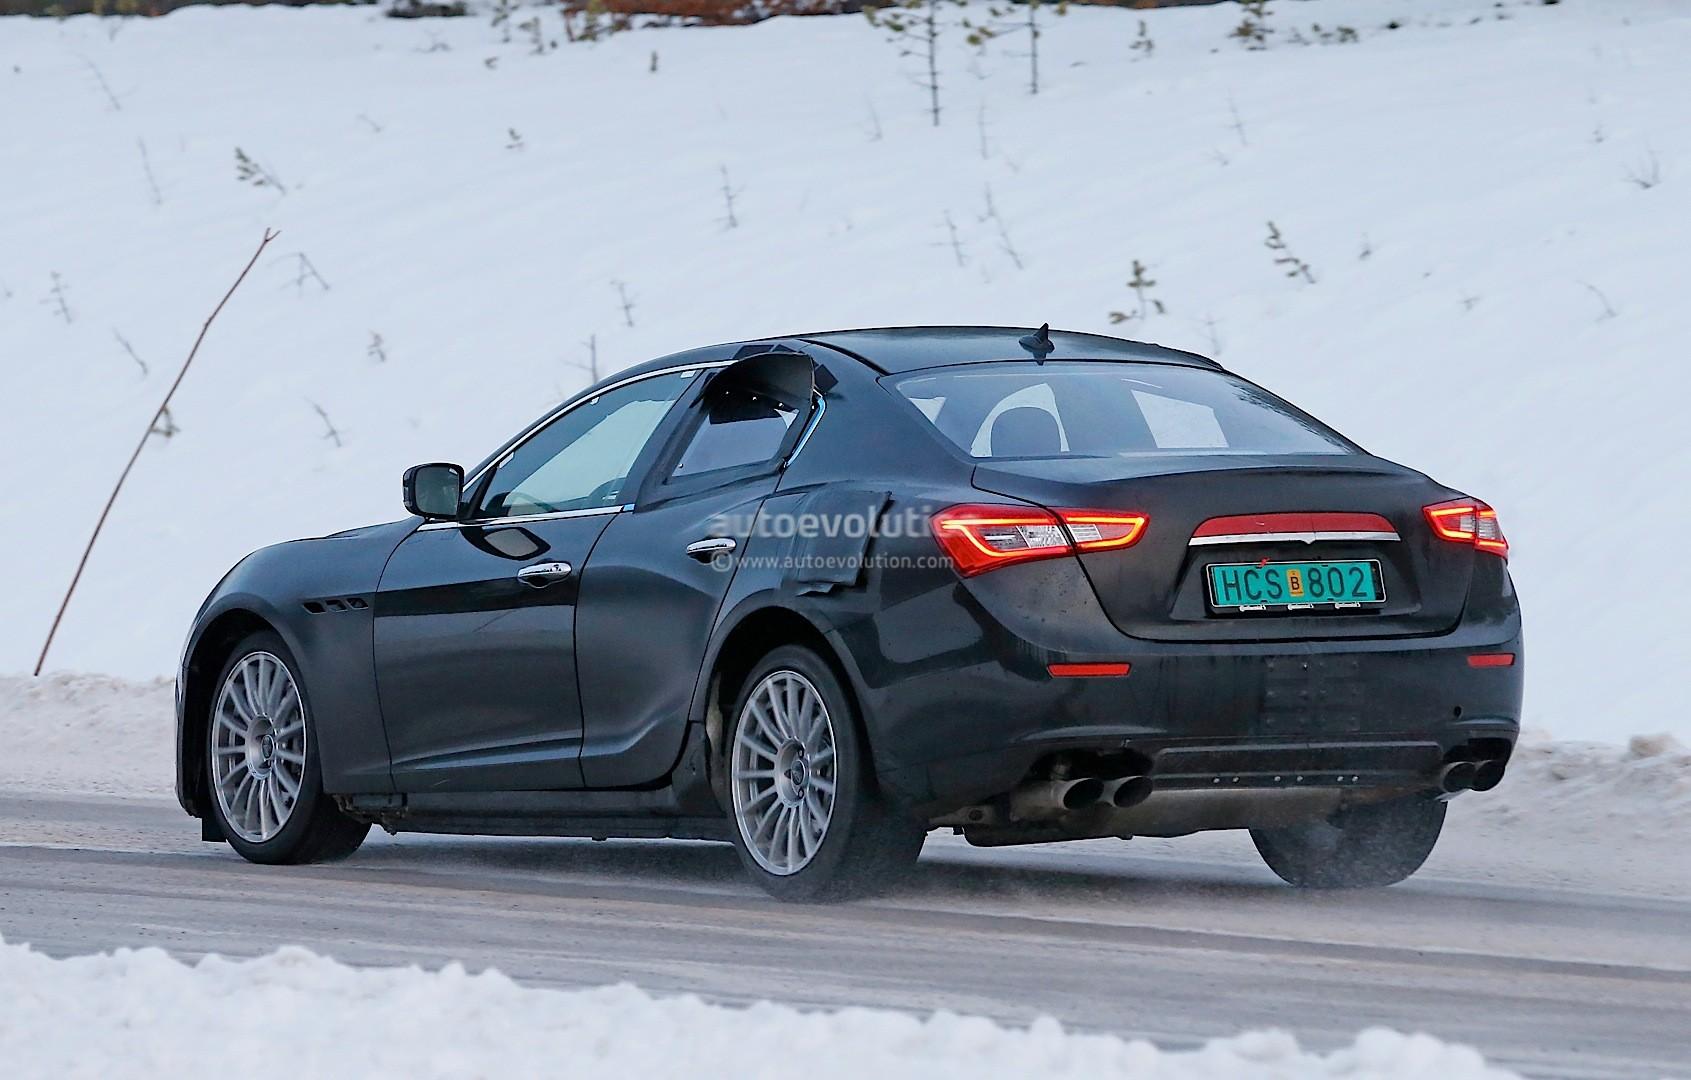 alfa-romeo-tipo-952-spied-winter-testing-its-a-giulia-sedan-test-mule-photo-gallery_8